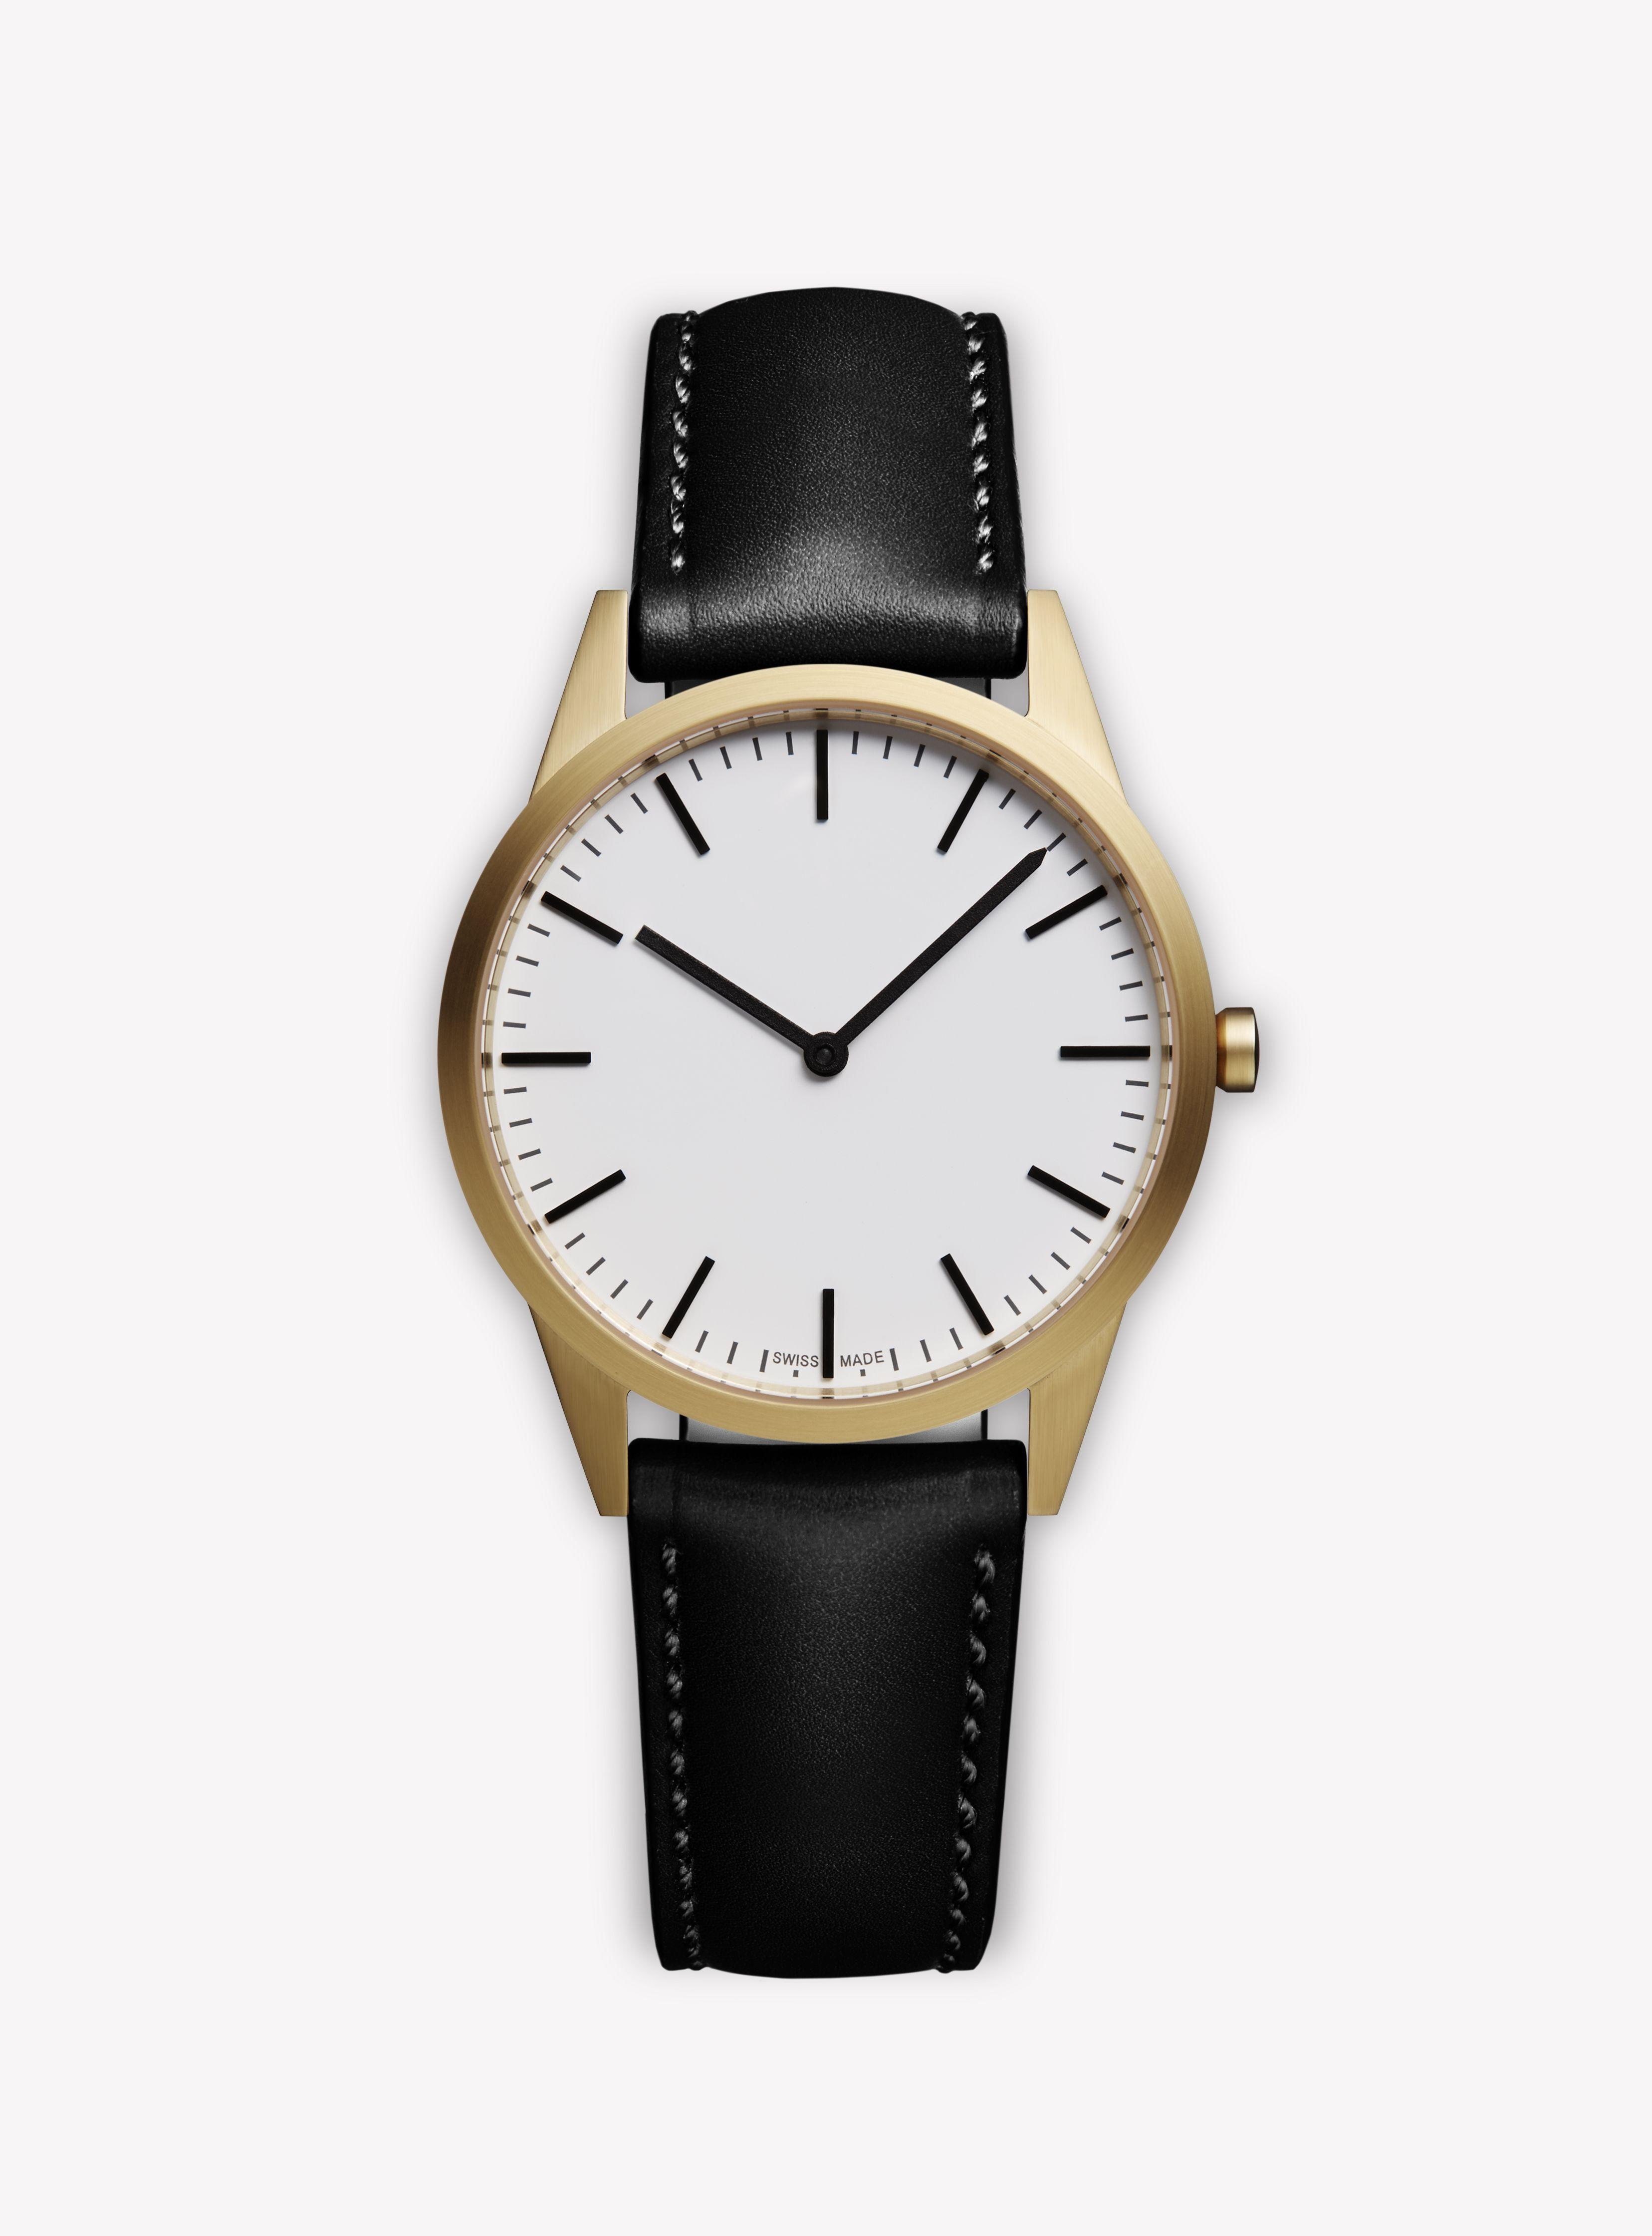 Uniform Wares C35 Watch Sgo 01 35mm 2 Hand Dress Watch Pvd Satin Gold Case White Dial With Black Uniform Wares Watch Second Hand Watches Brown Leather Watch [ 4481 x 3311 Pixel ]